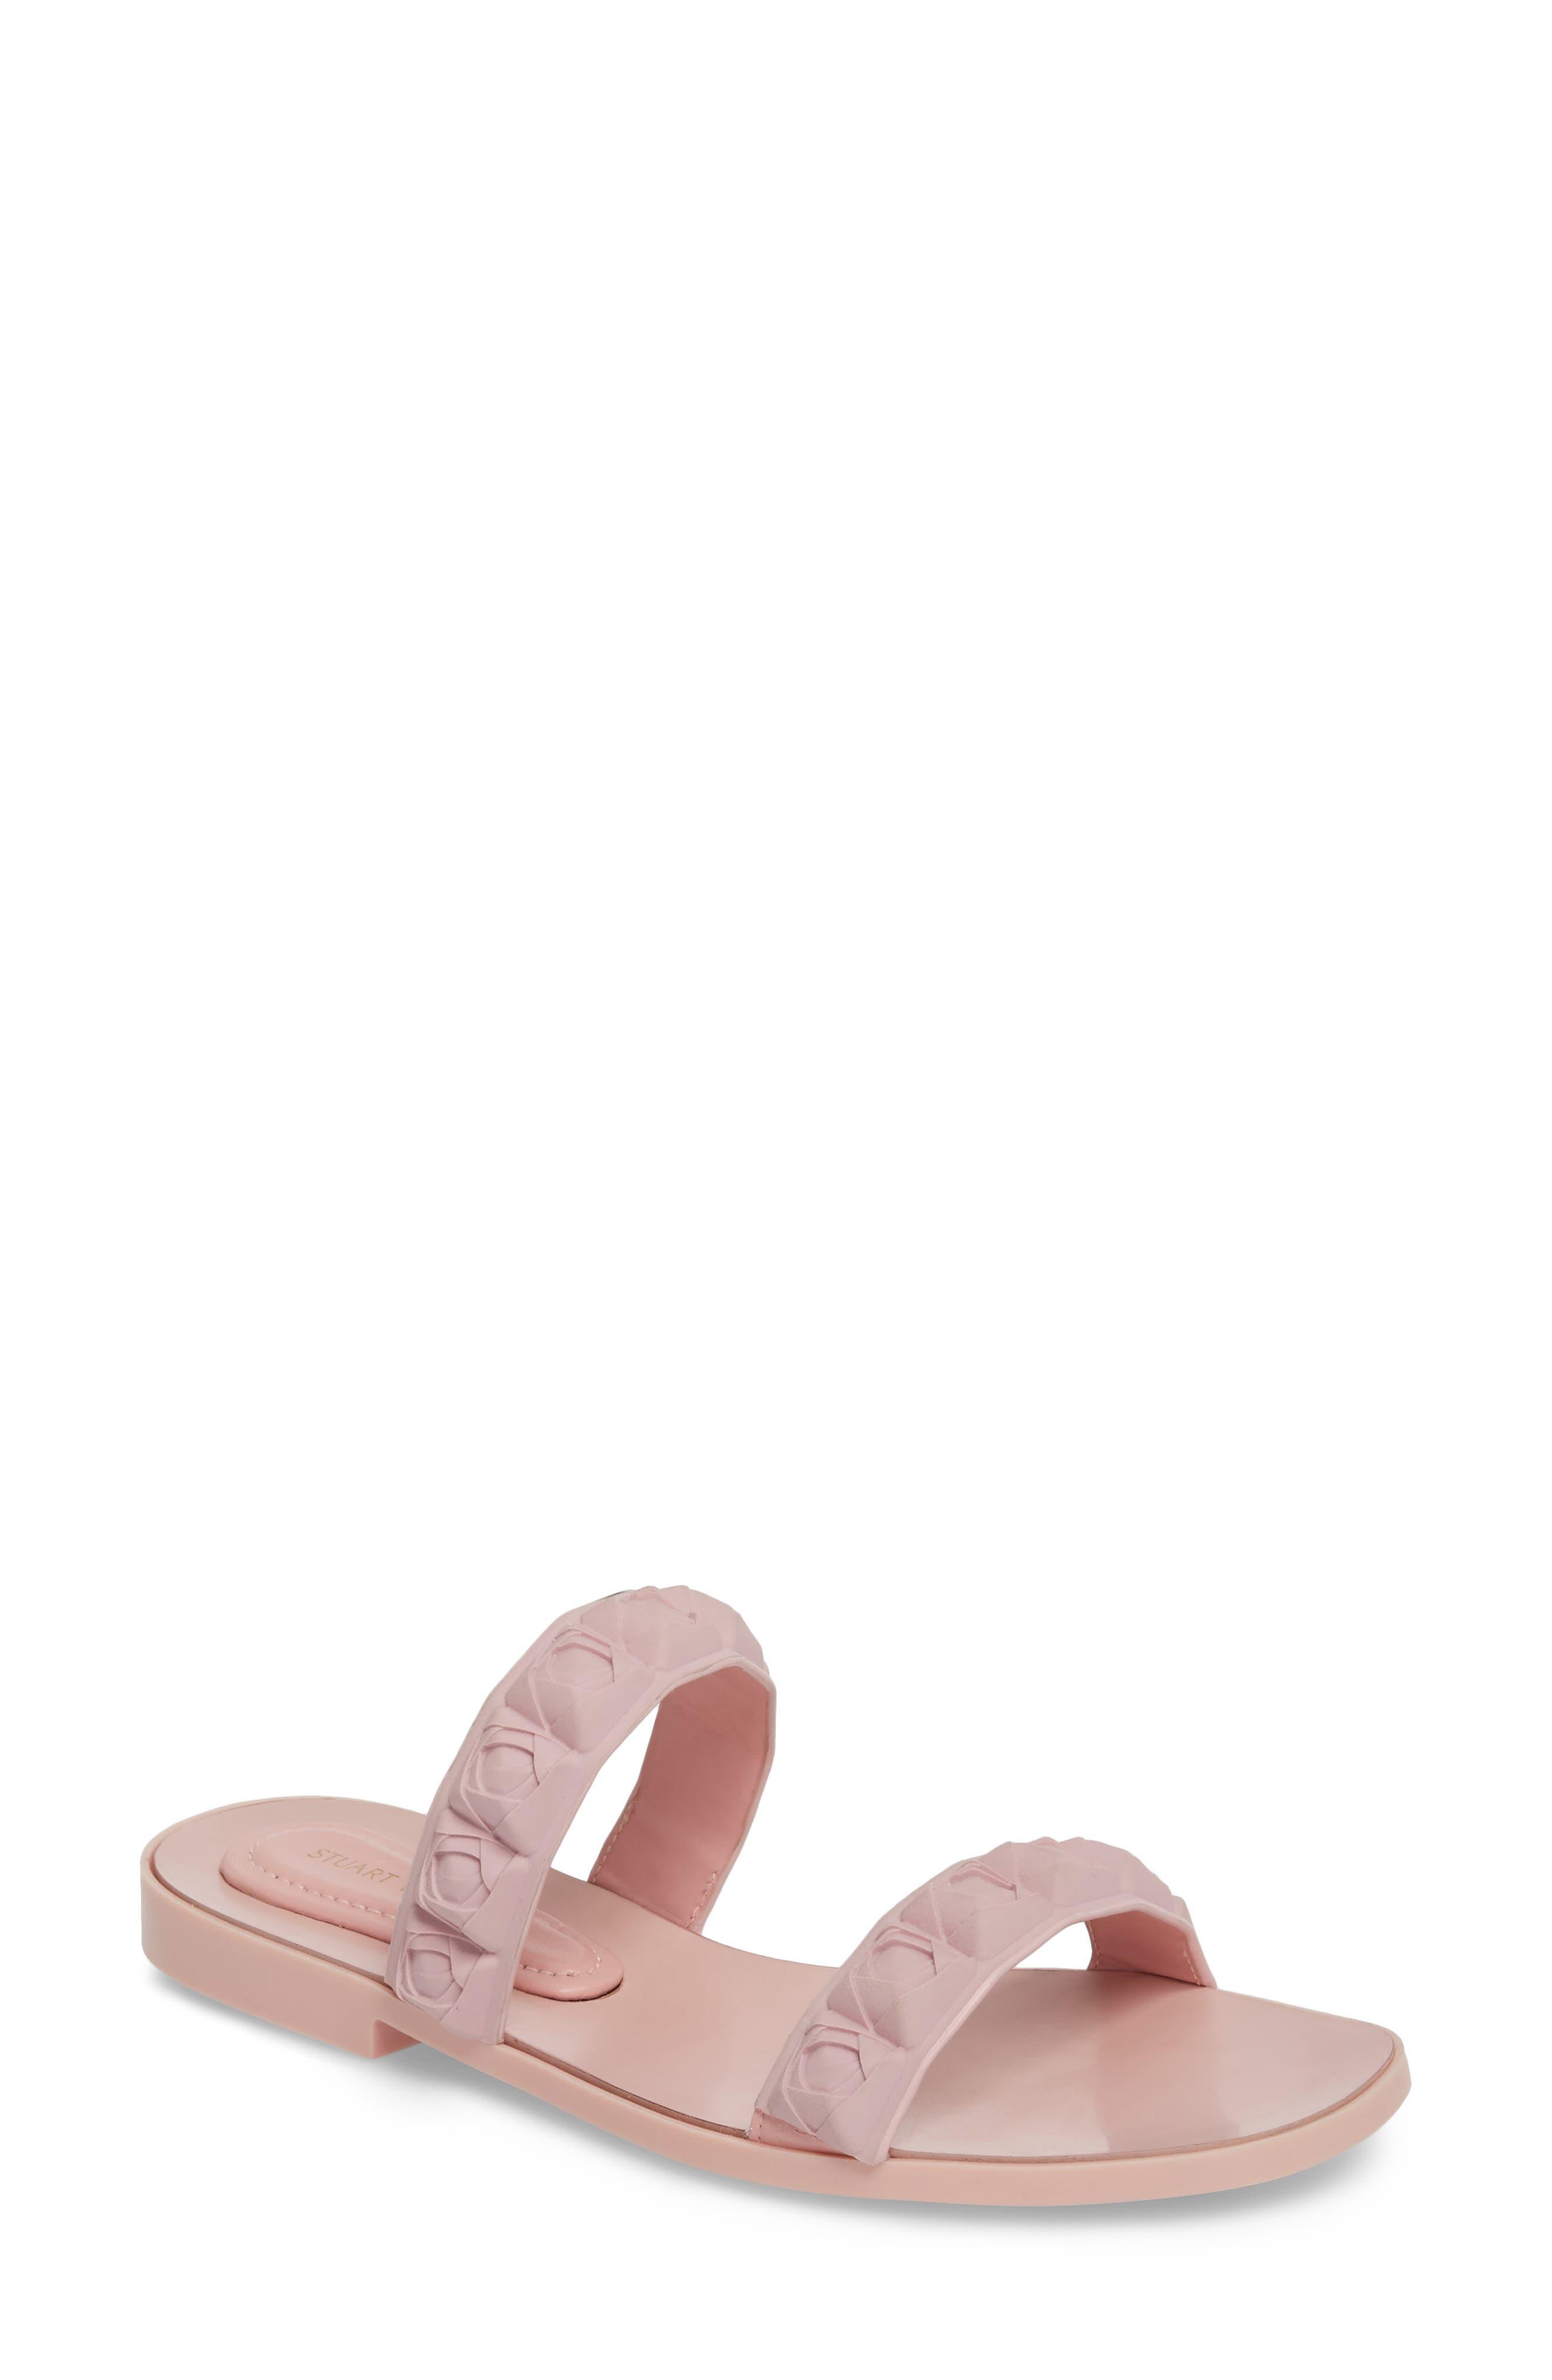 Rosita Dual Strap Slide Sandal,                             Main thumbnail 5, color,